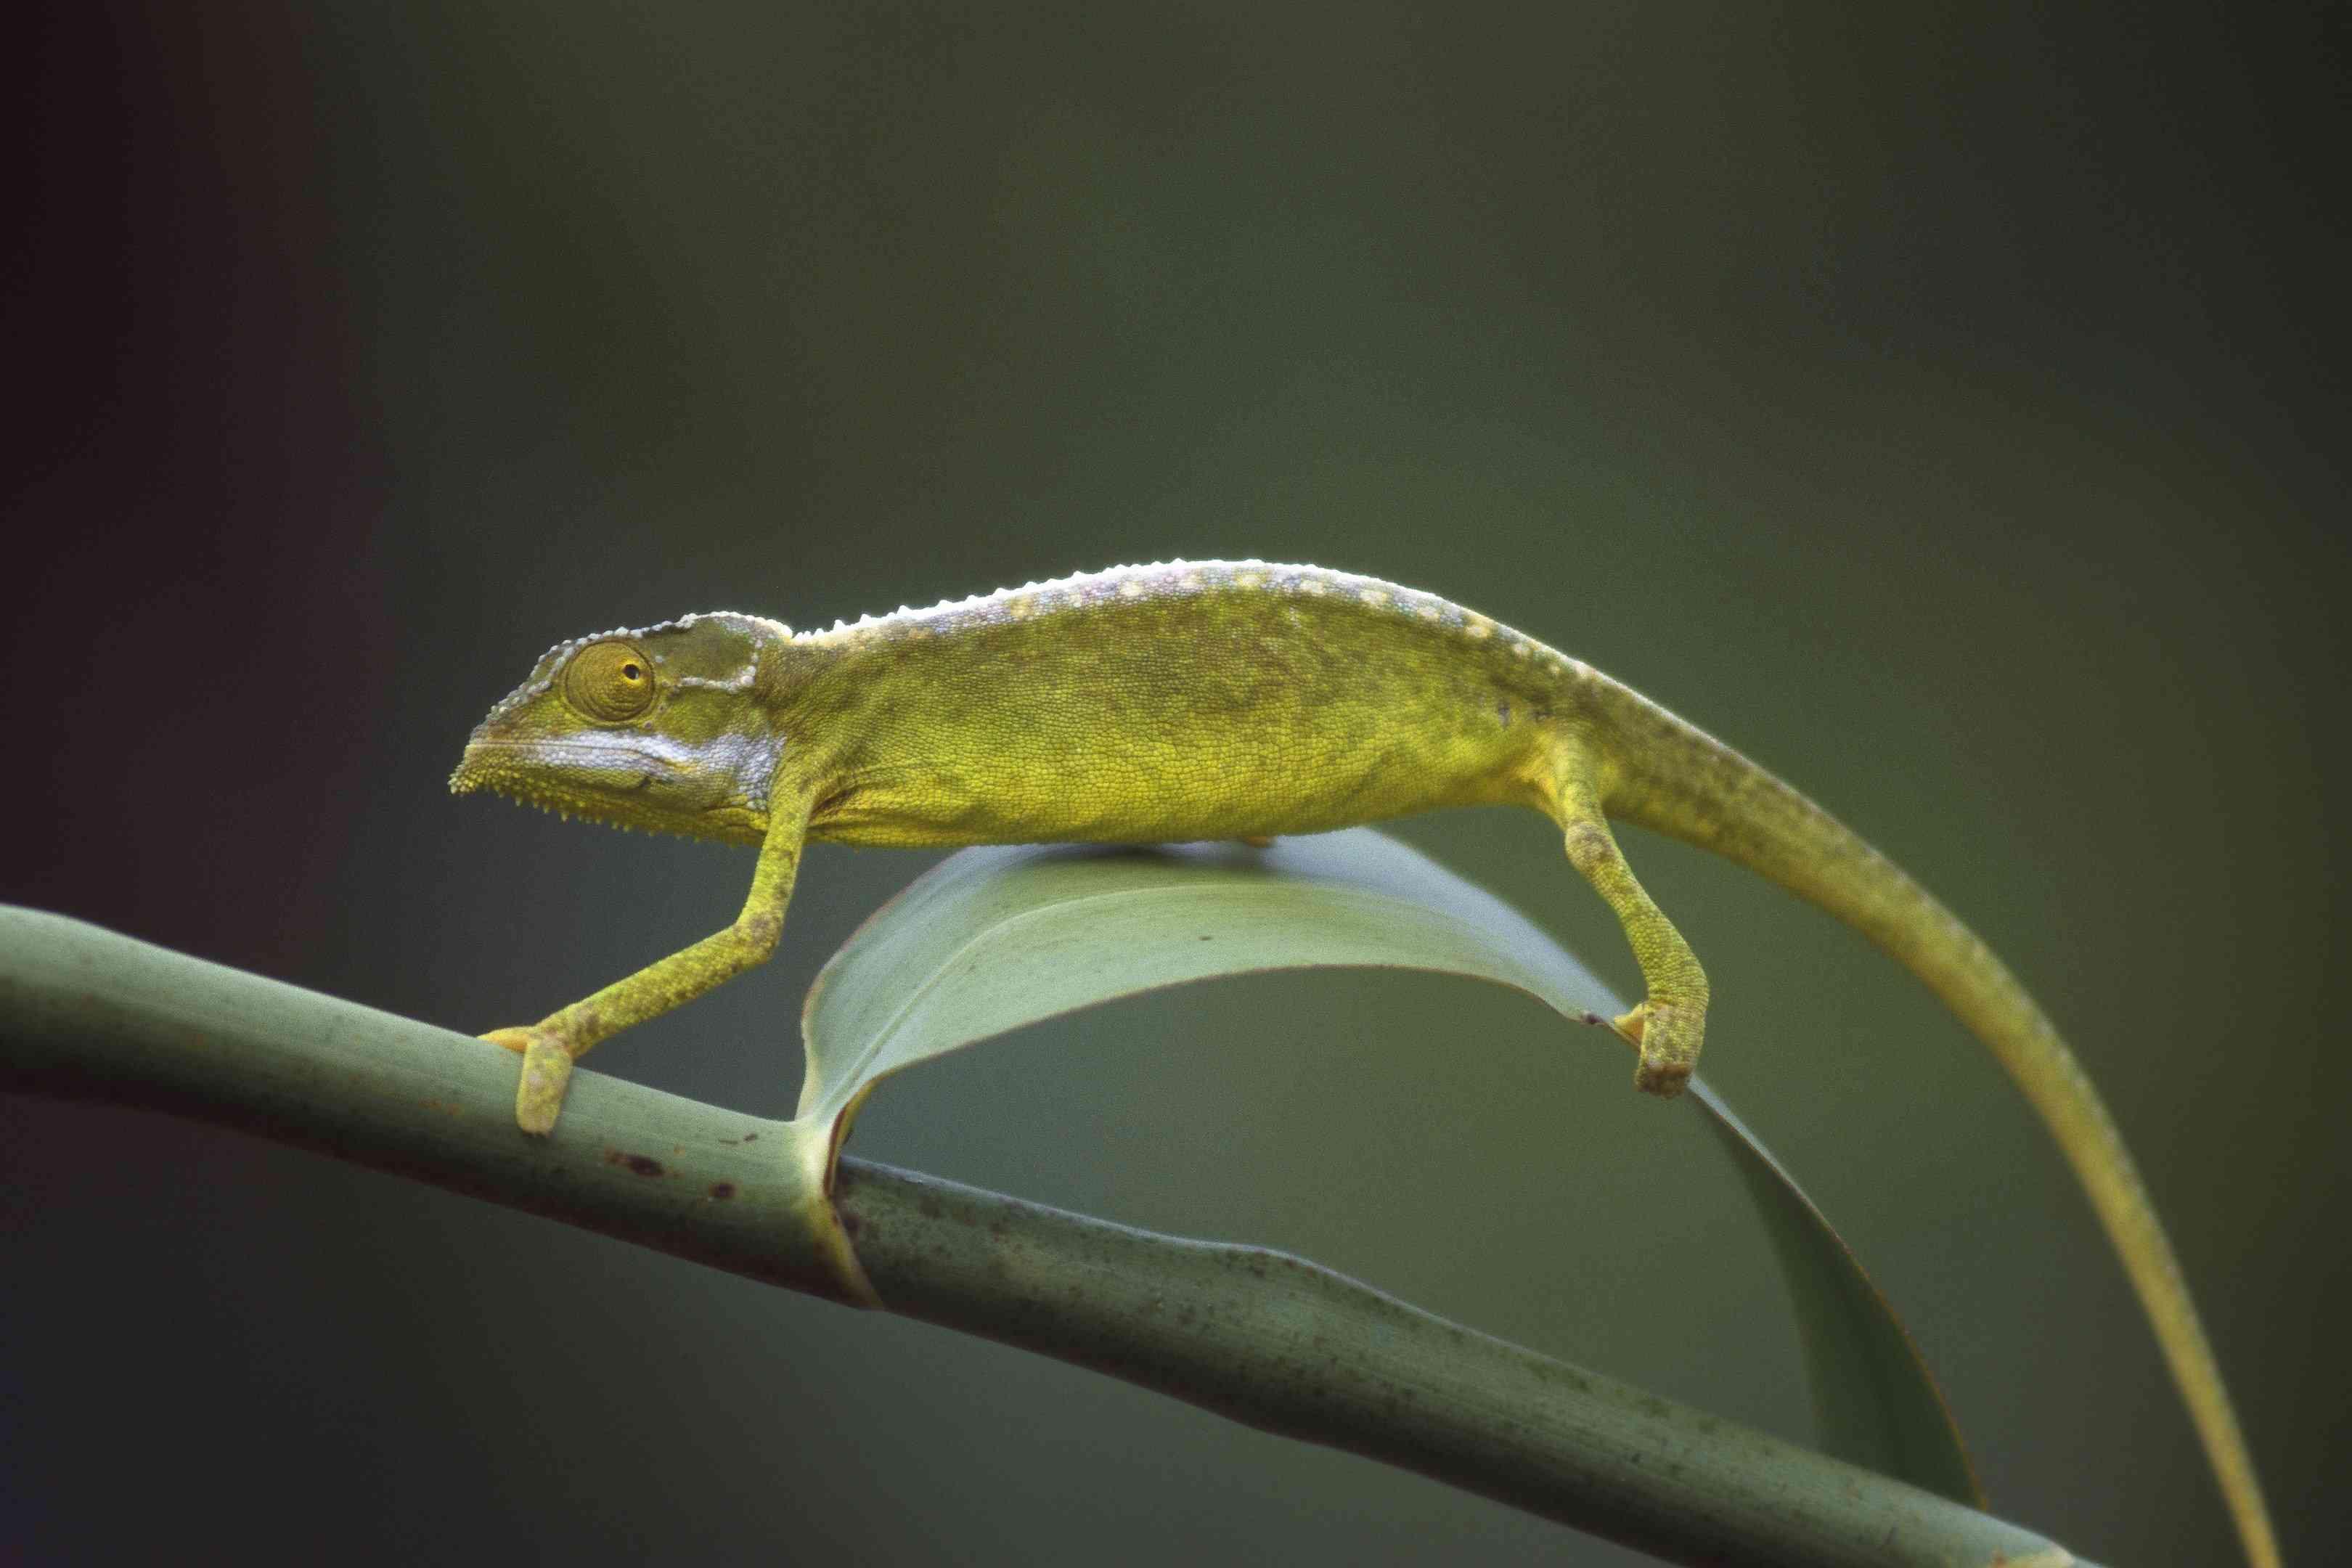 tiger chameleon on branch